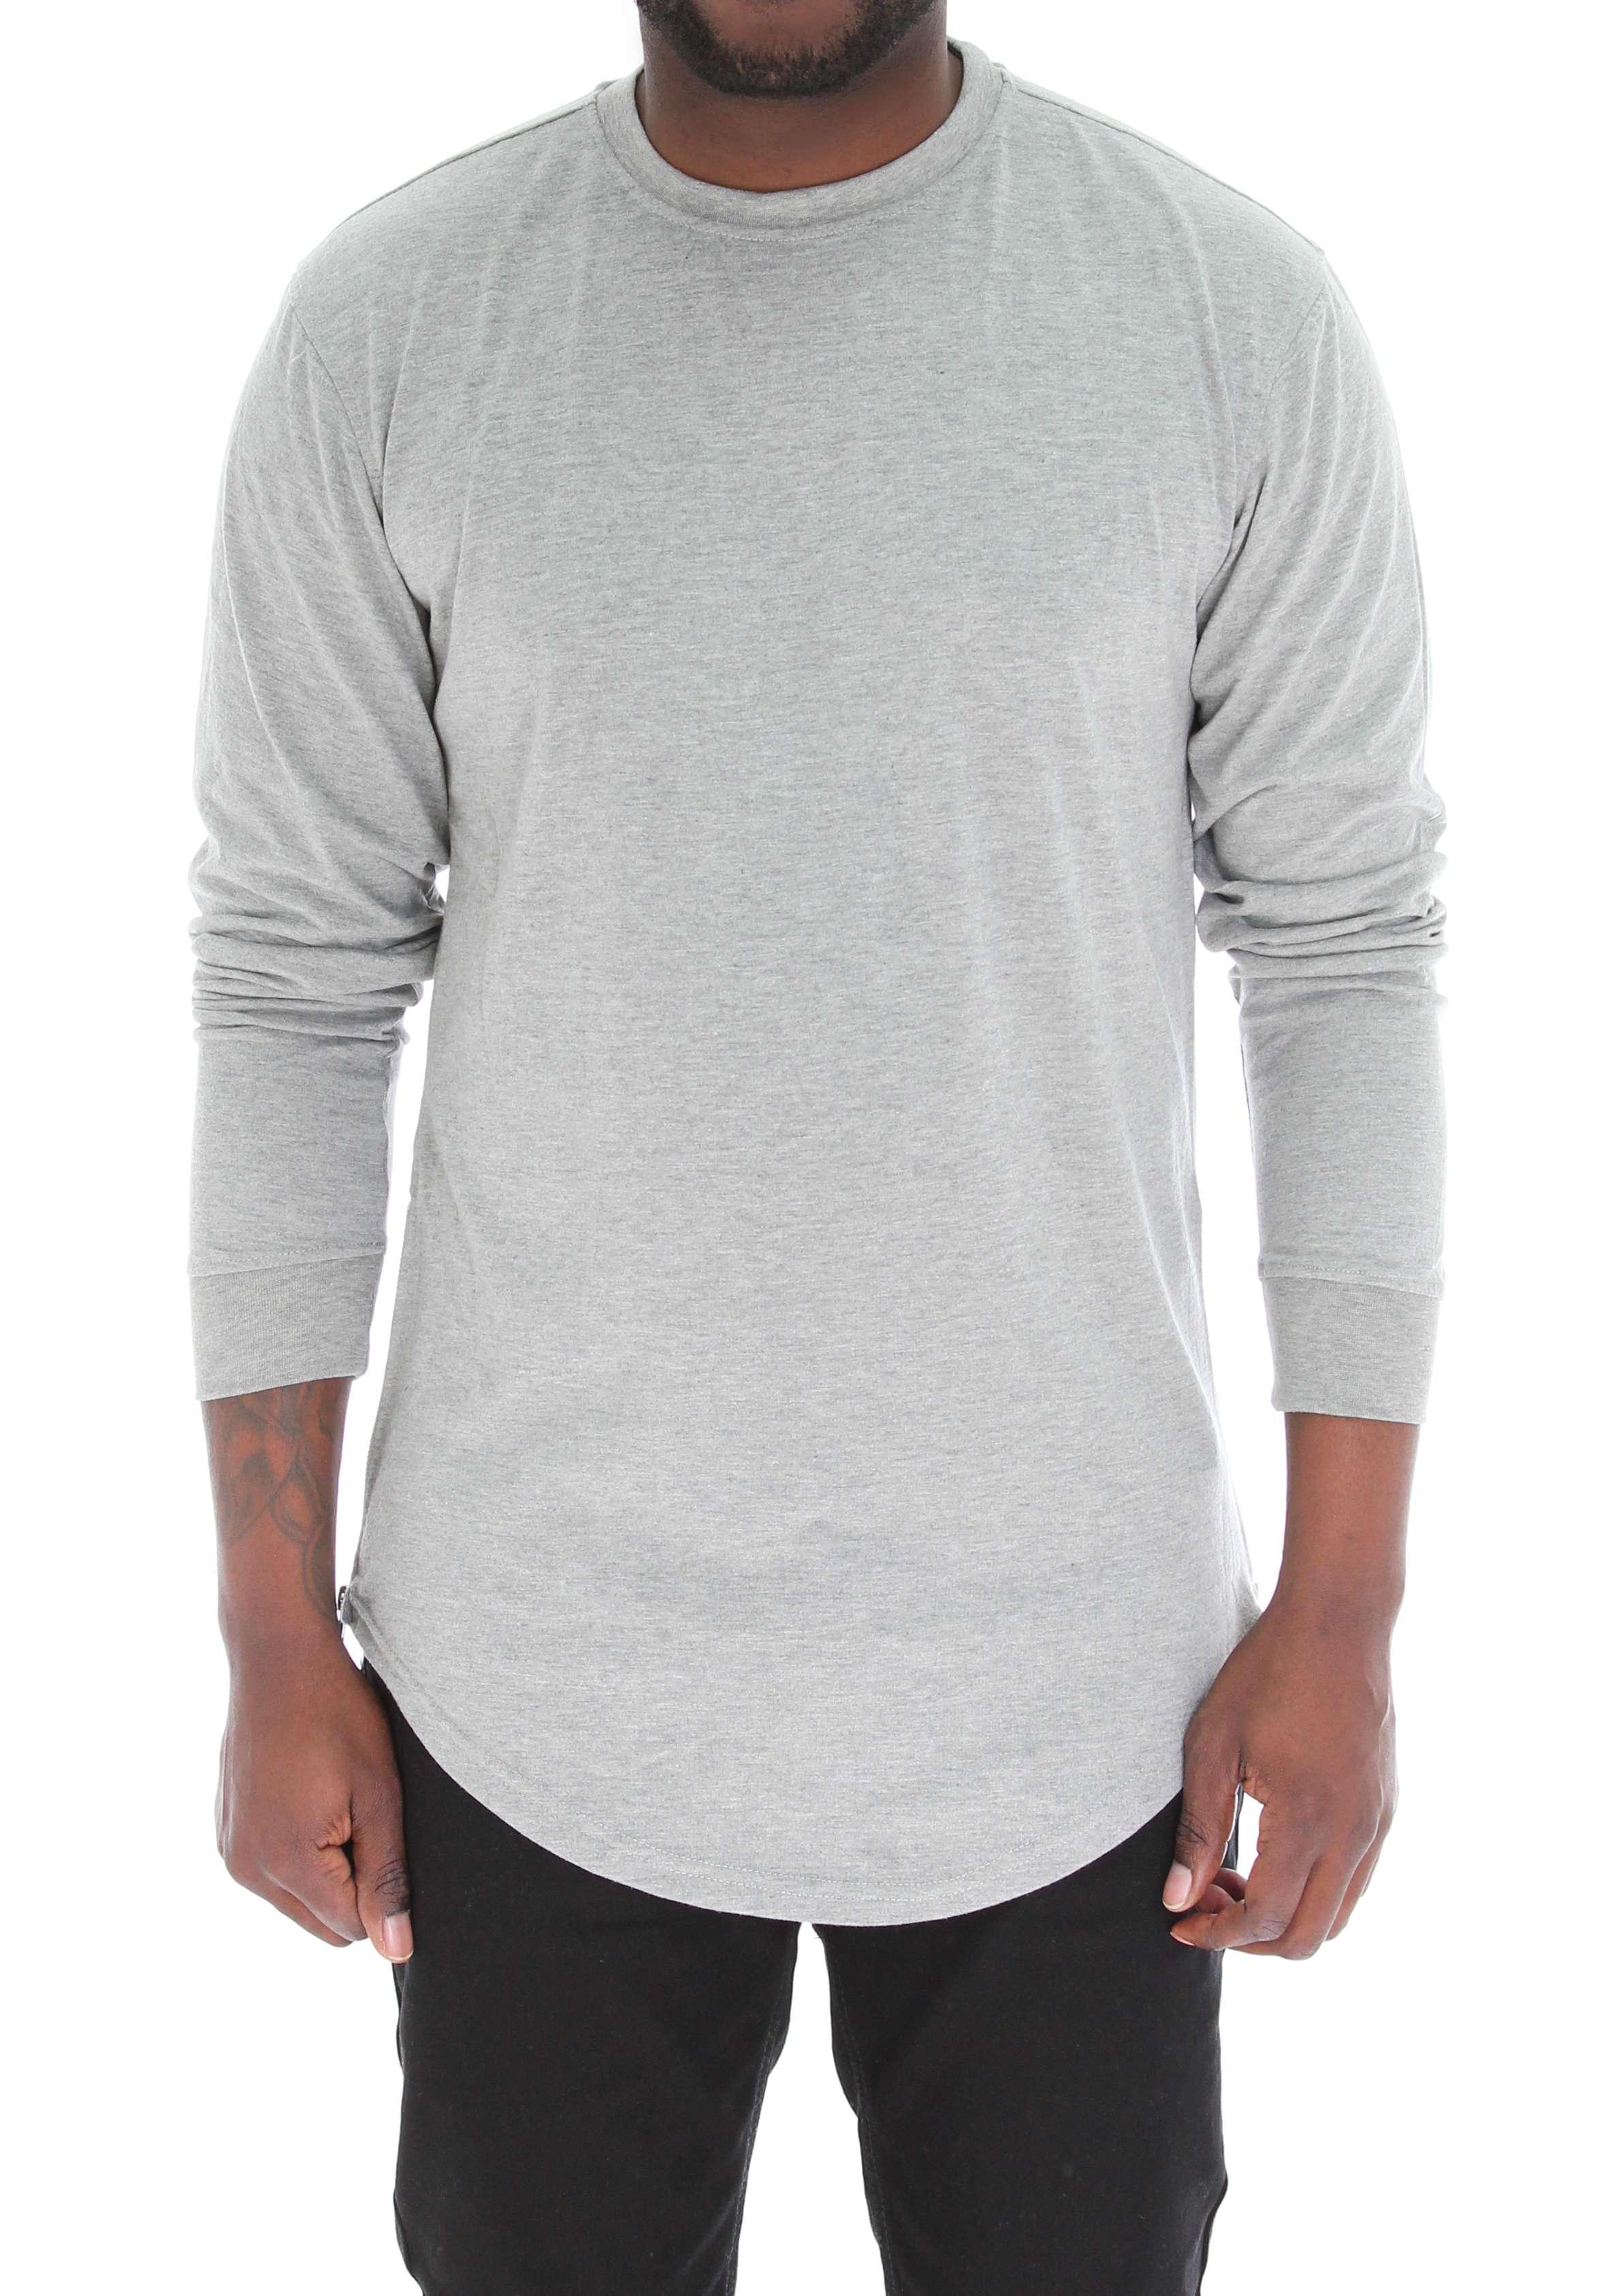 7ed75ac21 Bleecker & Mercer Men's Long Sleeve Longline T Shirt with Side Zippers